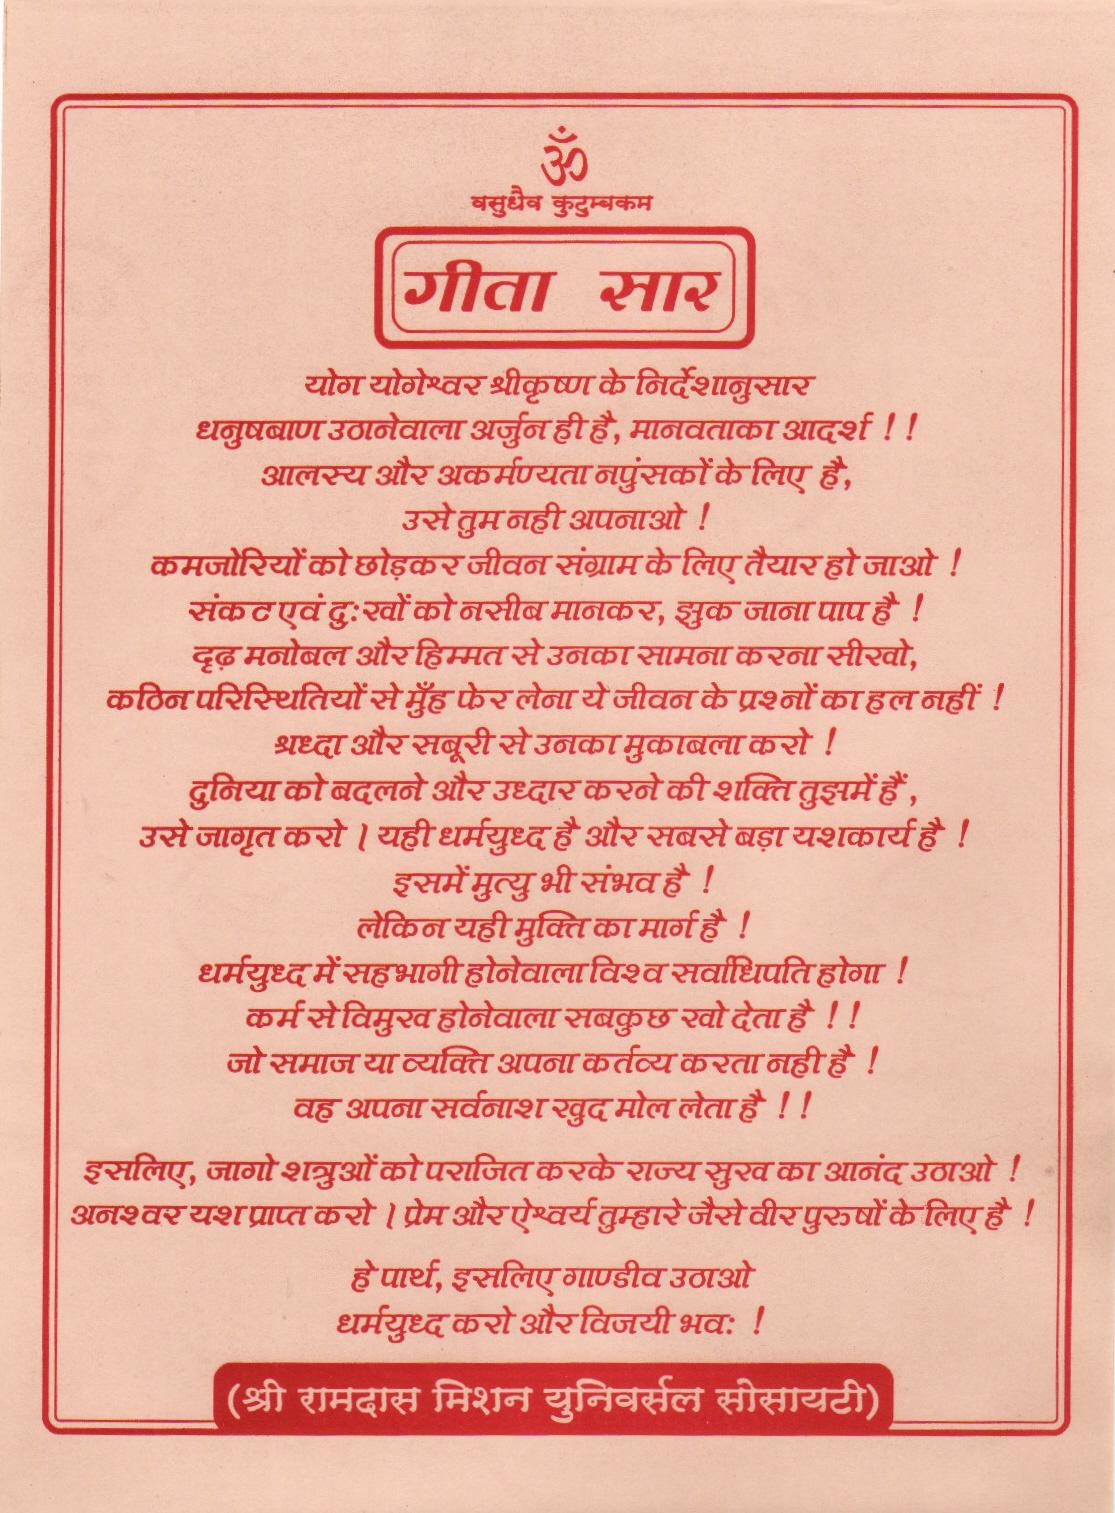 Padapooja Gita Saar In Hindi The Correct One